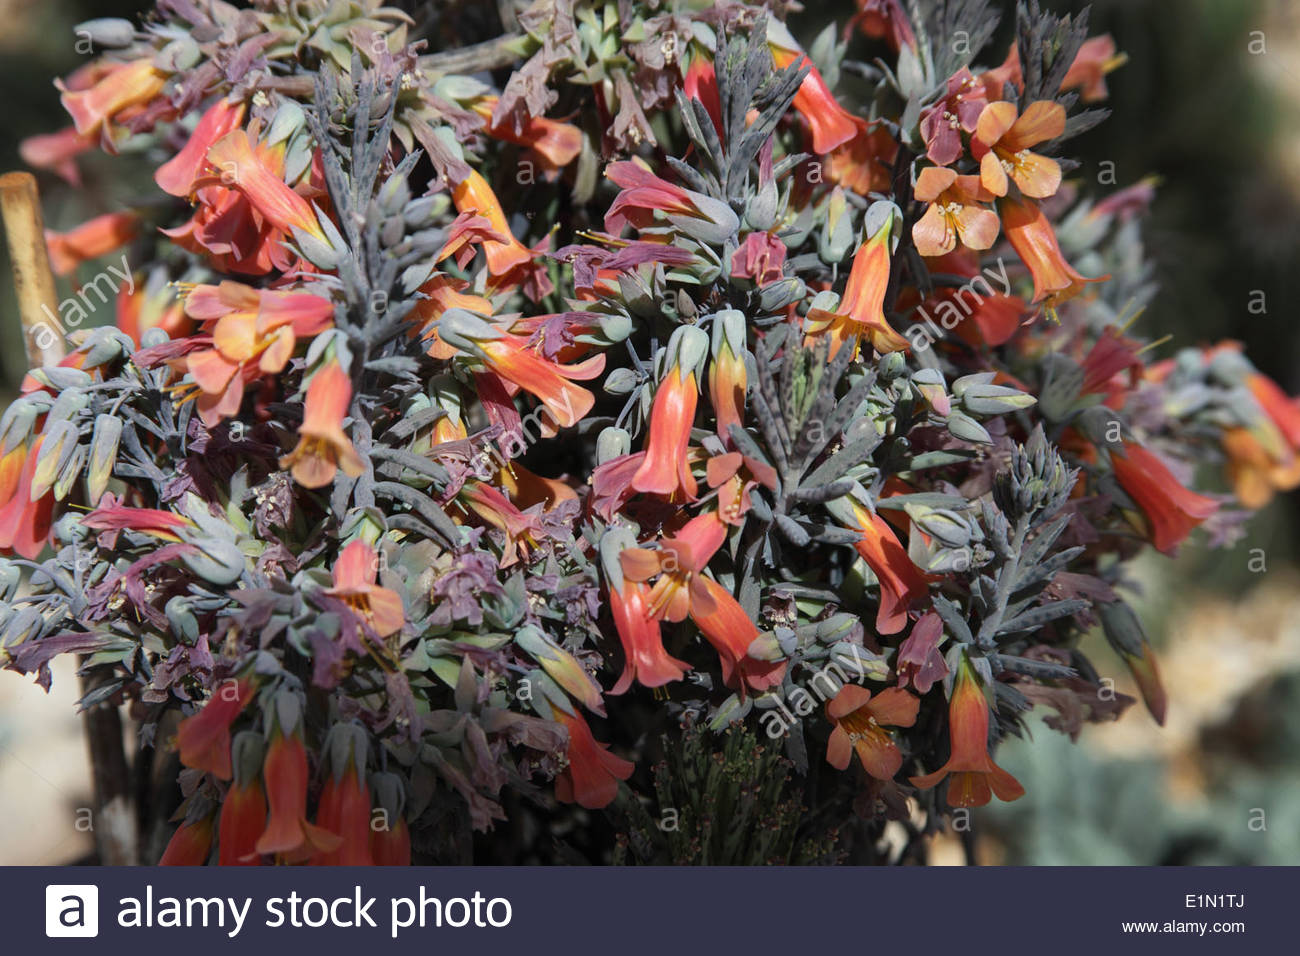 Bryophyllum Delagoense Close Up Of Flowers Stock Photo, Royalty.